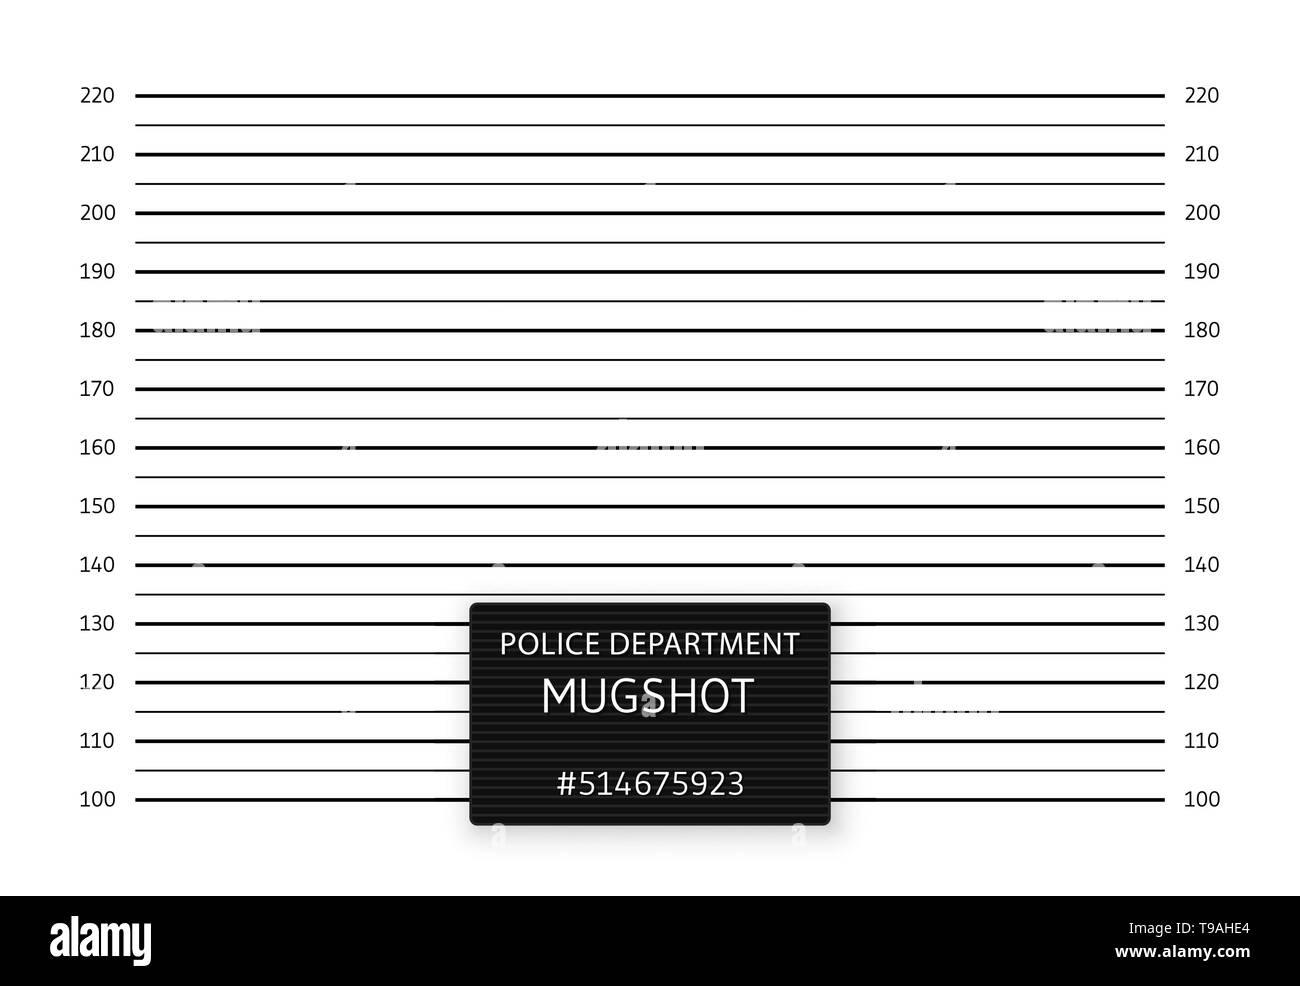 Police lineup or mugshot background. Vector illustration. - Stock Image